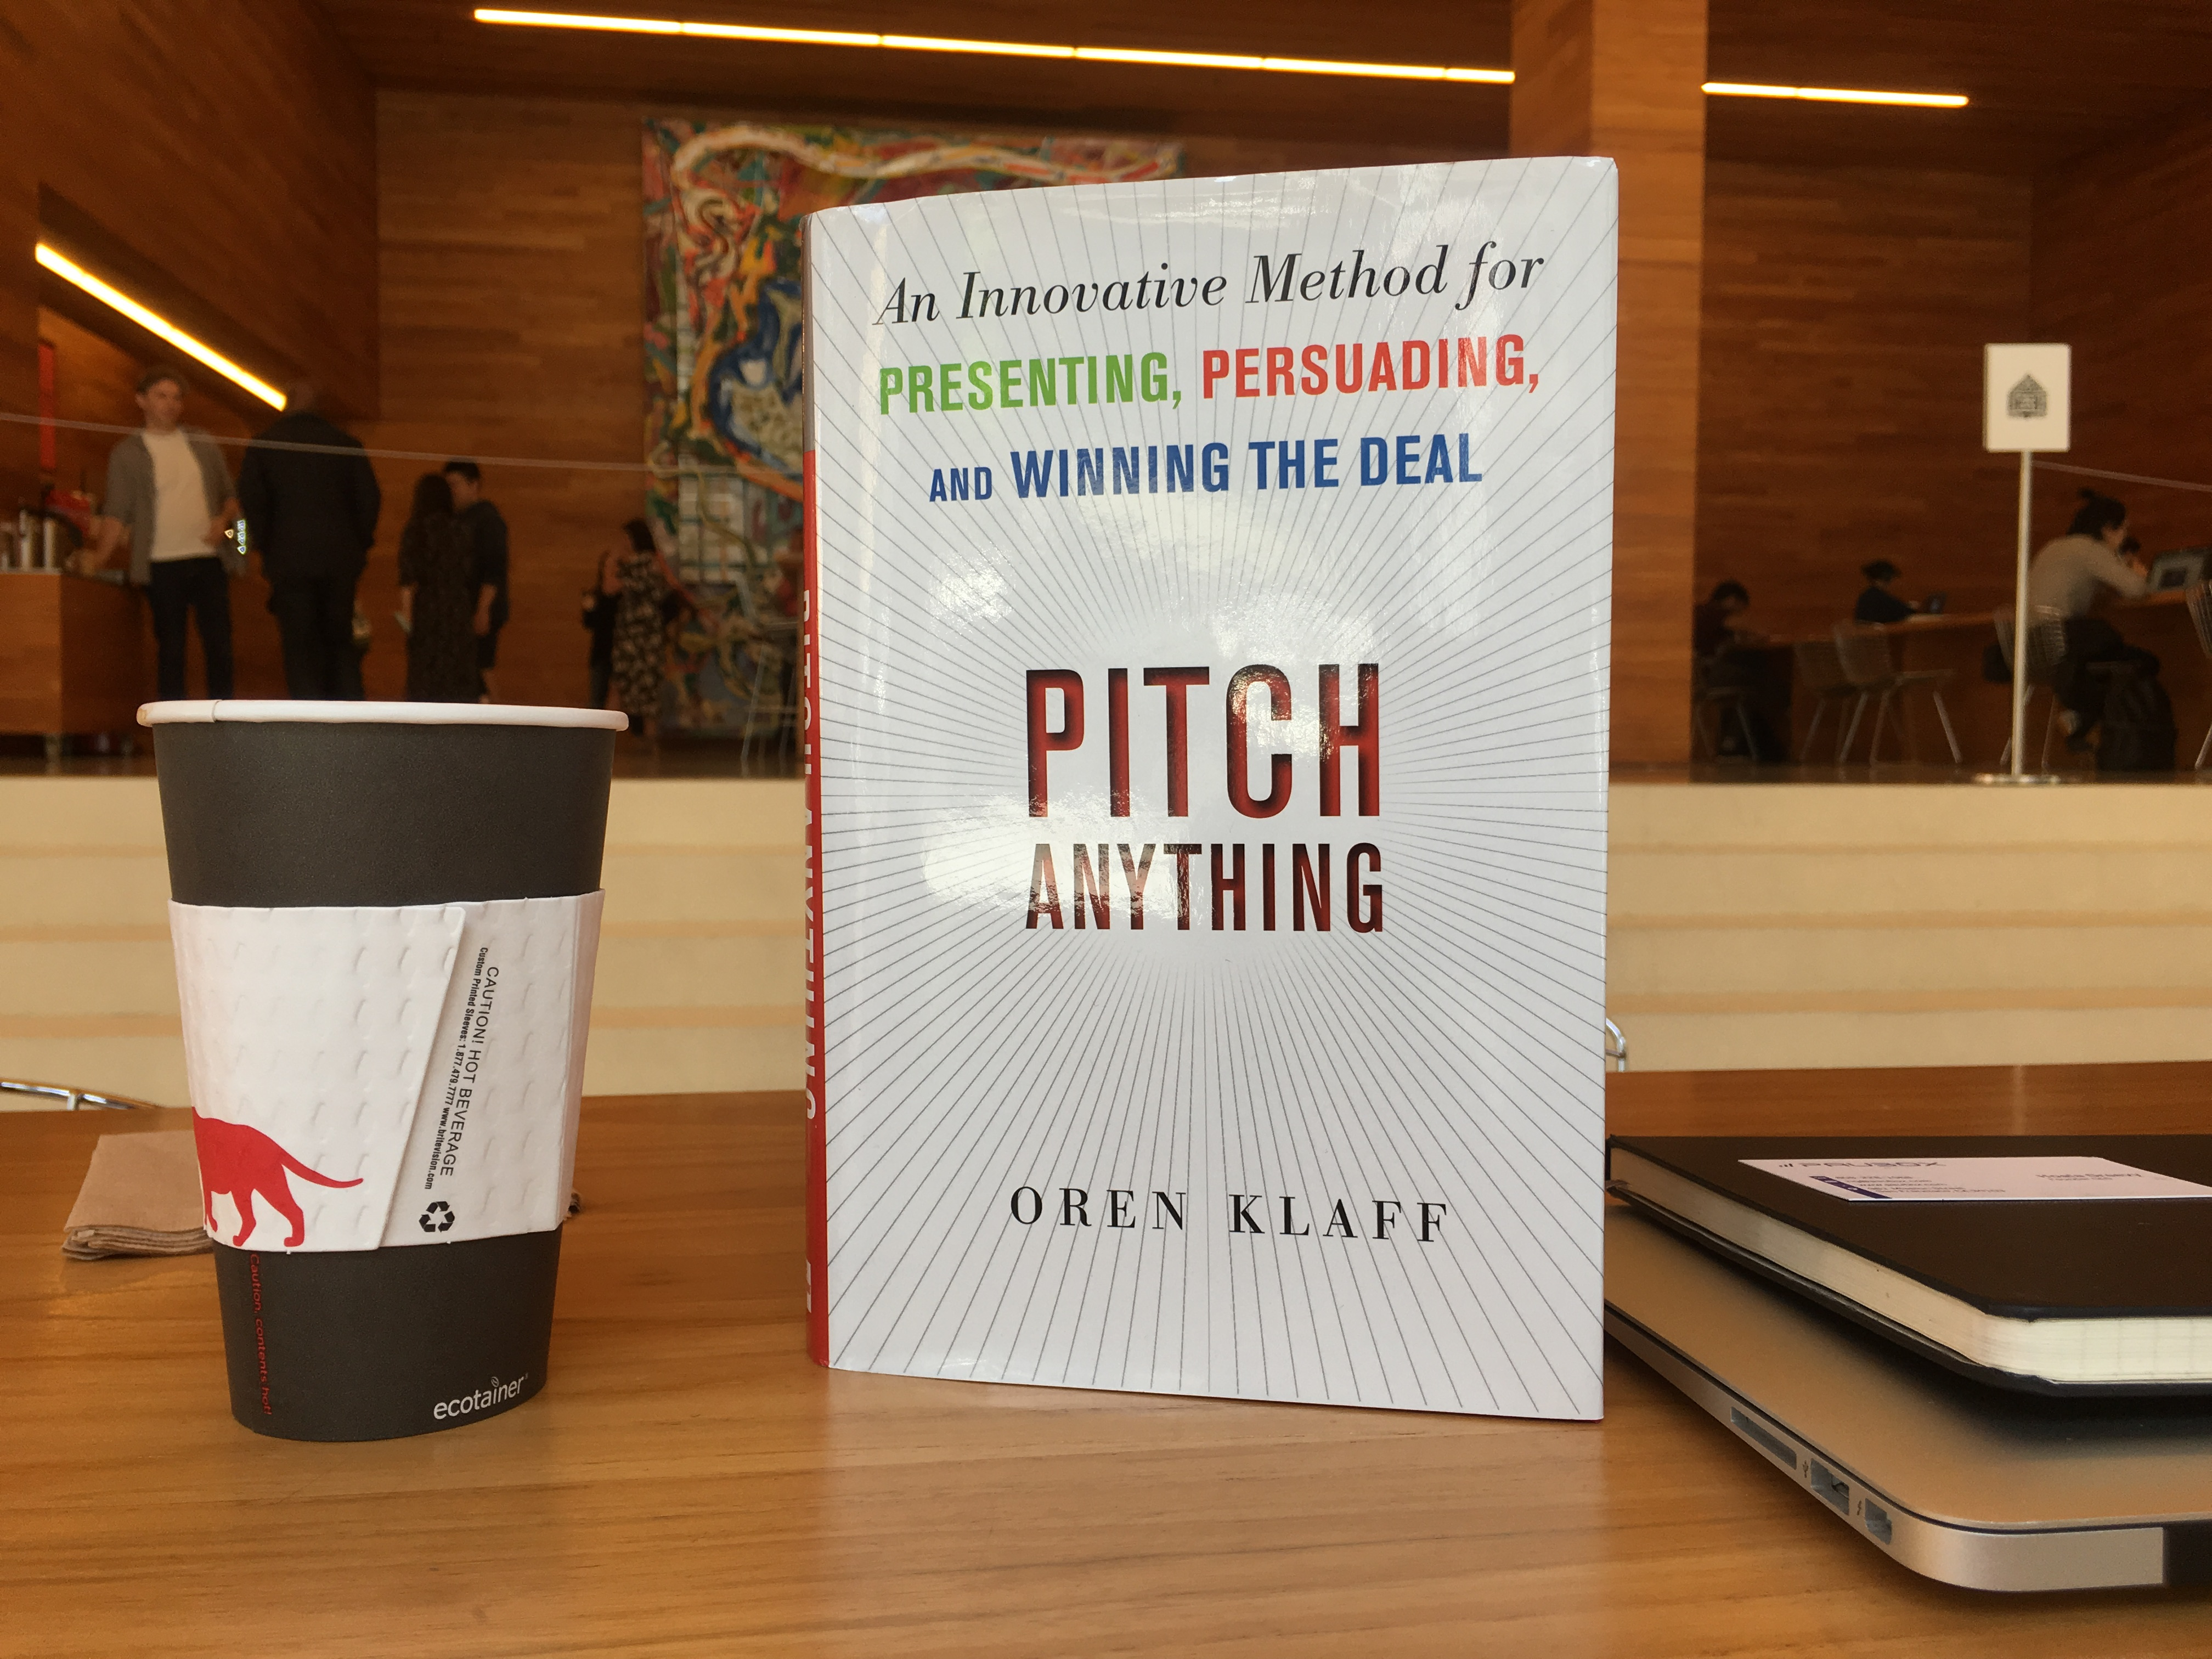 Pitch Anything by Oren Klaff: My Takeaways - Paubox